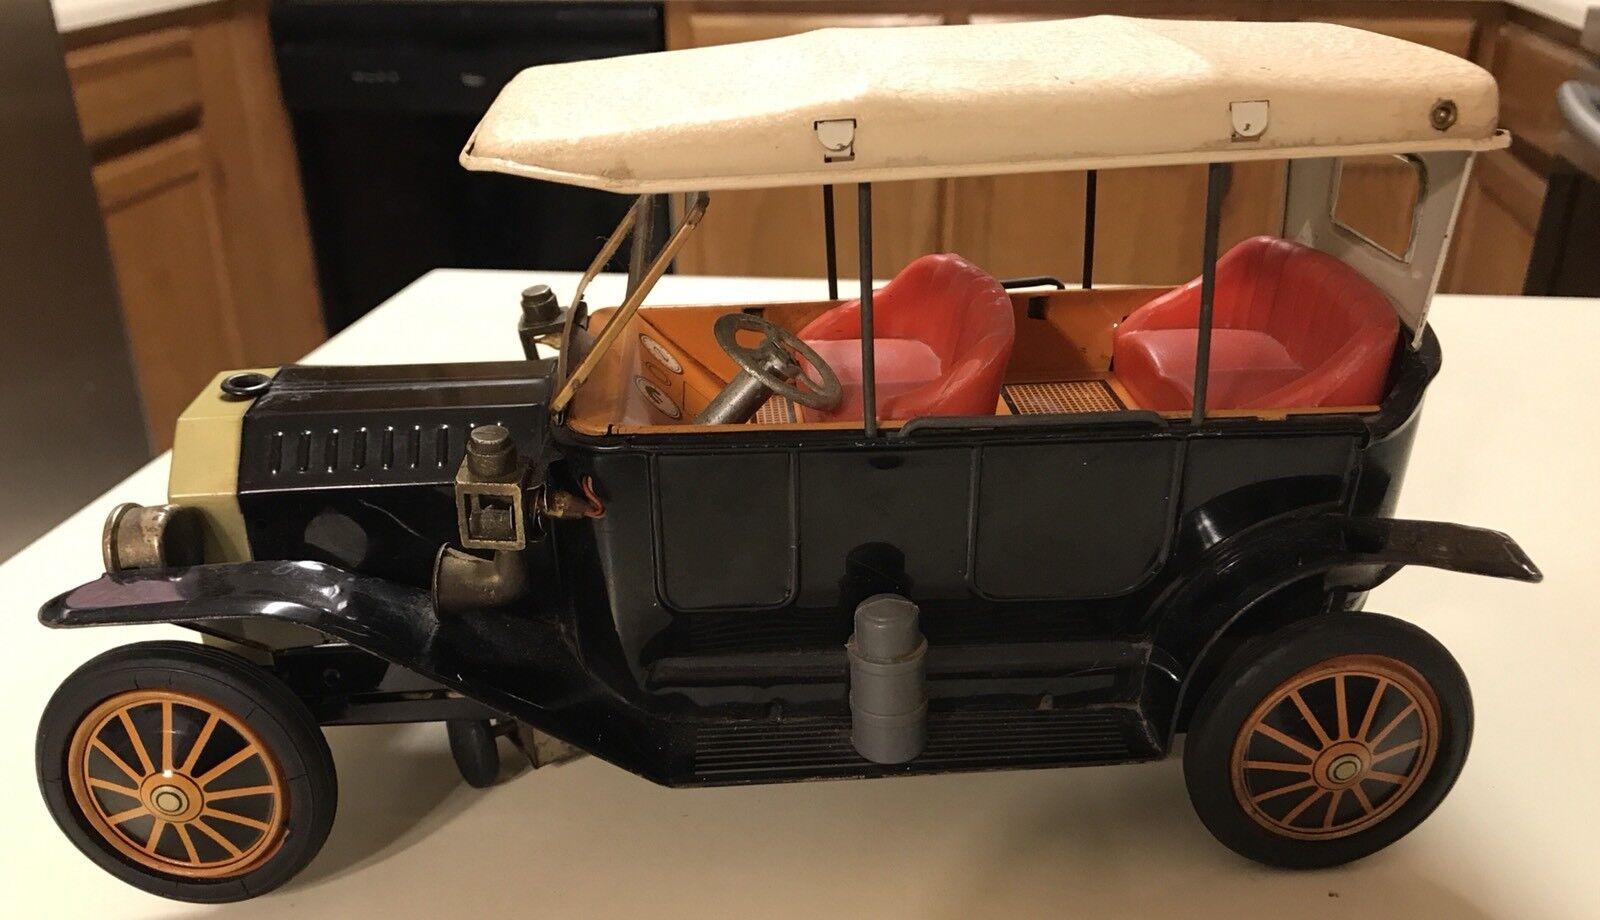 Oldtimer - modell ford modell t sch spielzeug batteriebetriebene tin toy